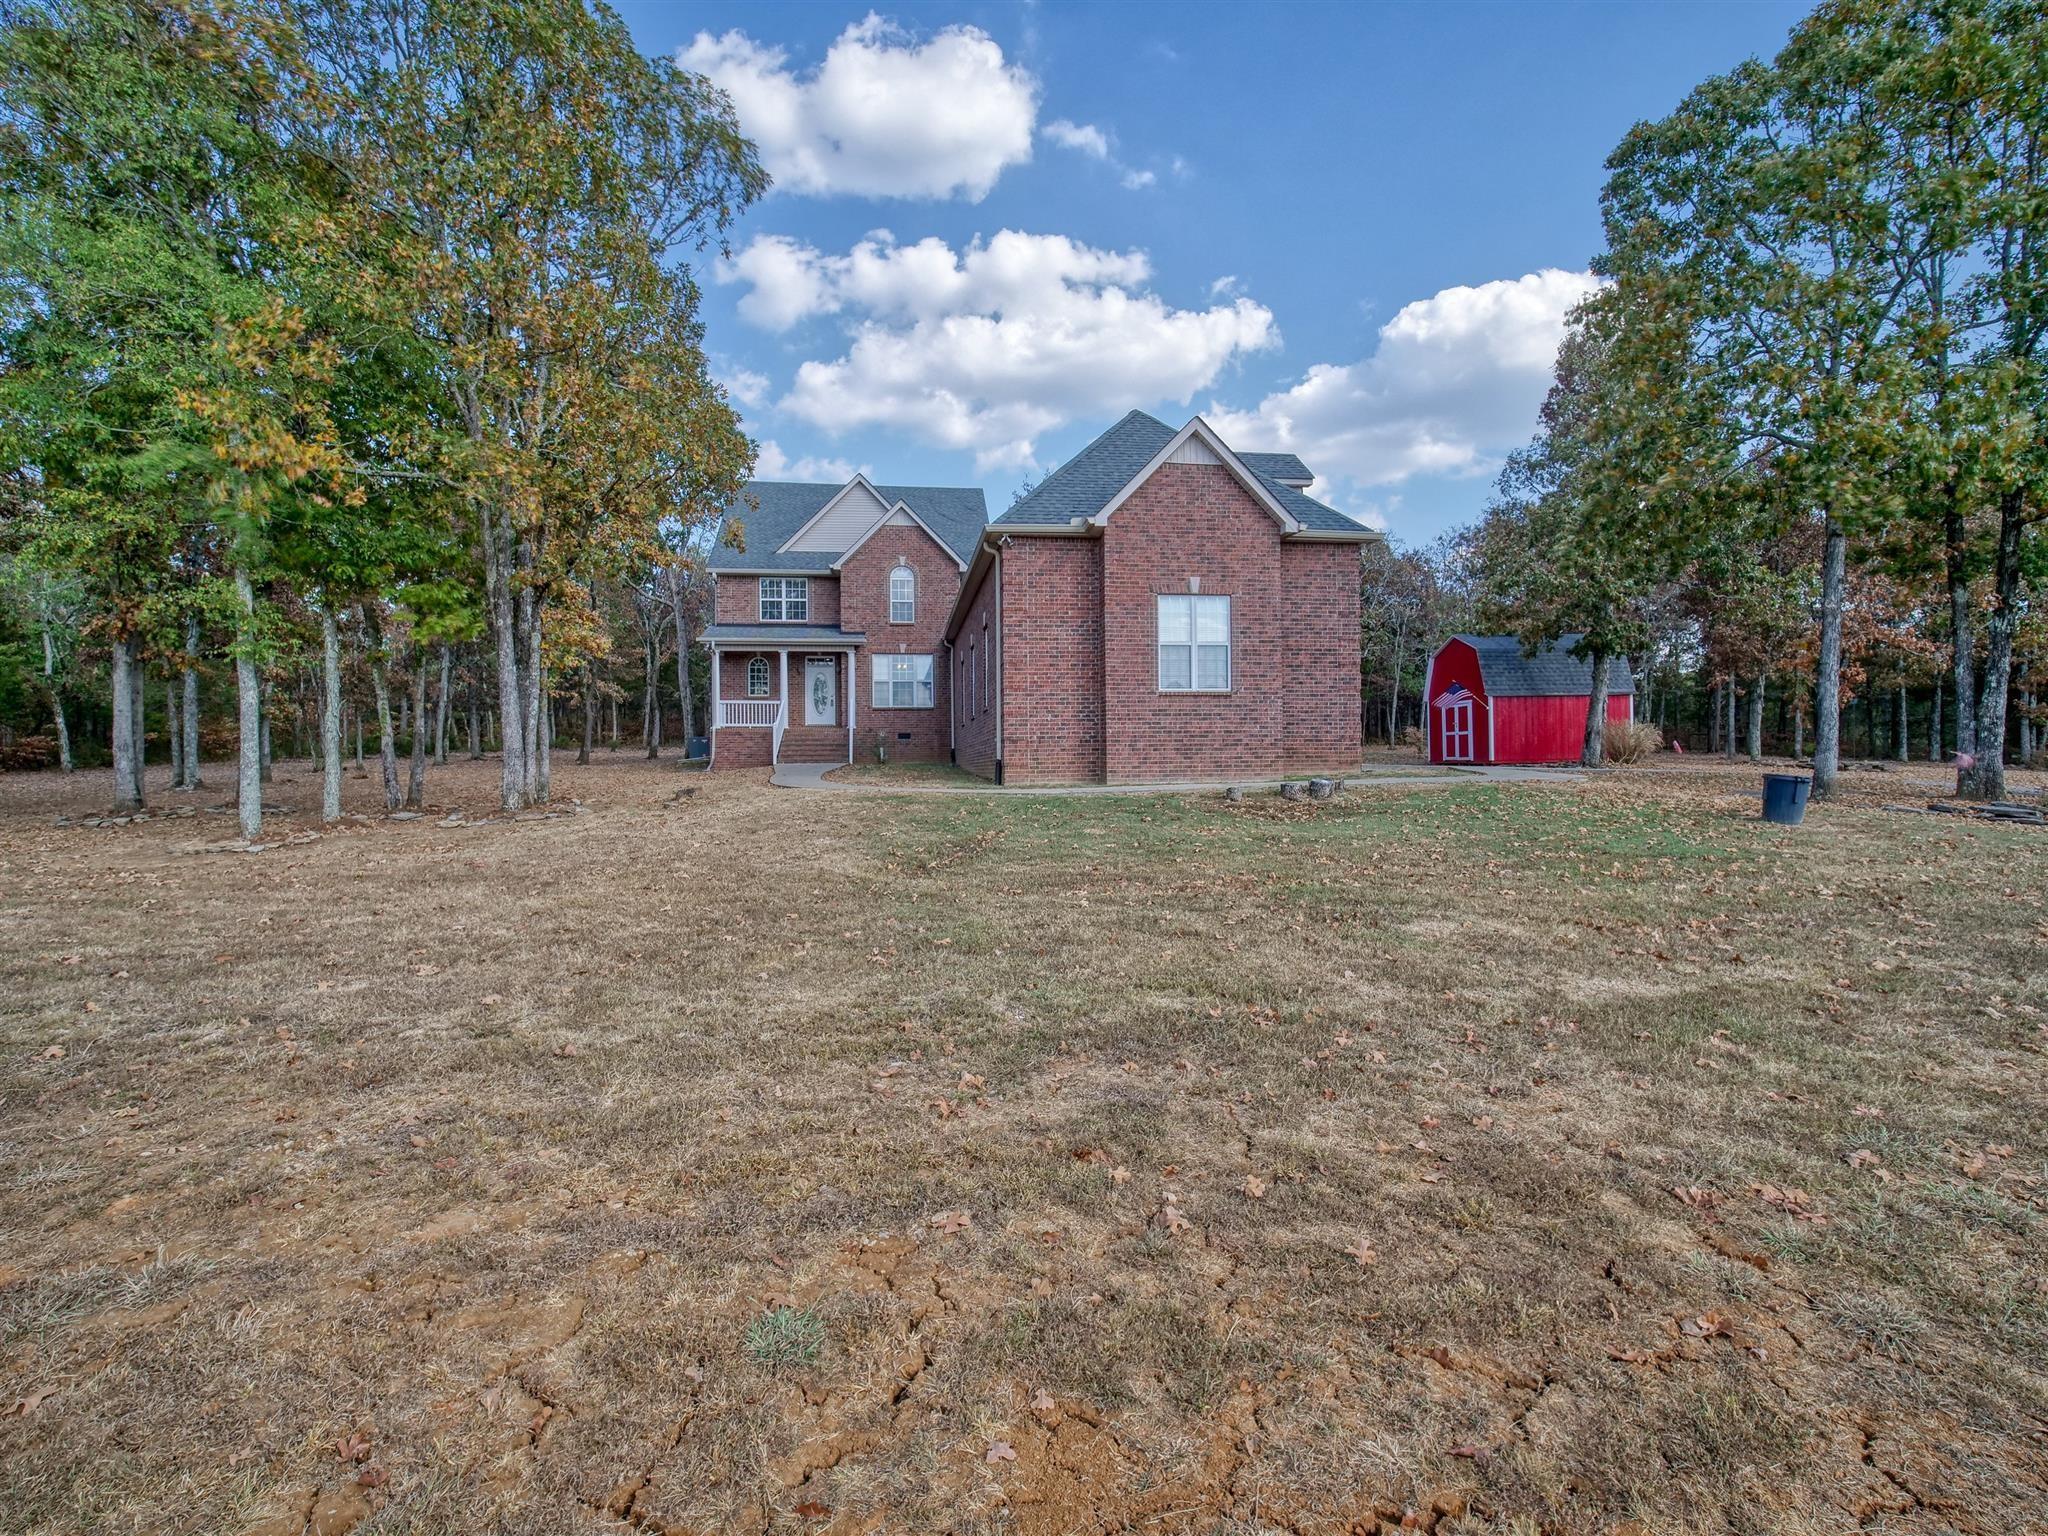 6675 Jones Ln, Murfreesboro, TN 37127 - Murfreesboro, TN real estate listing